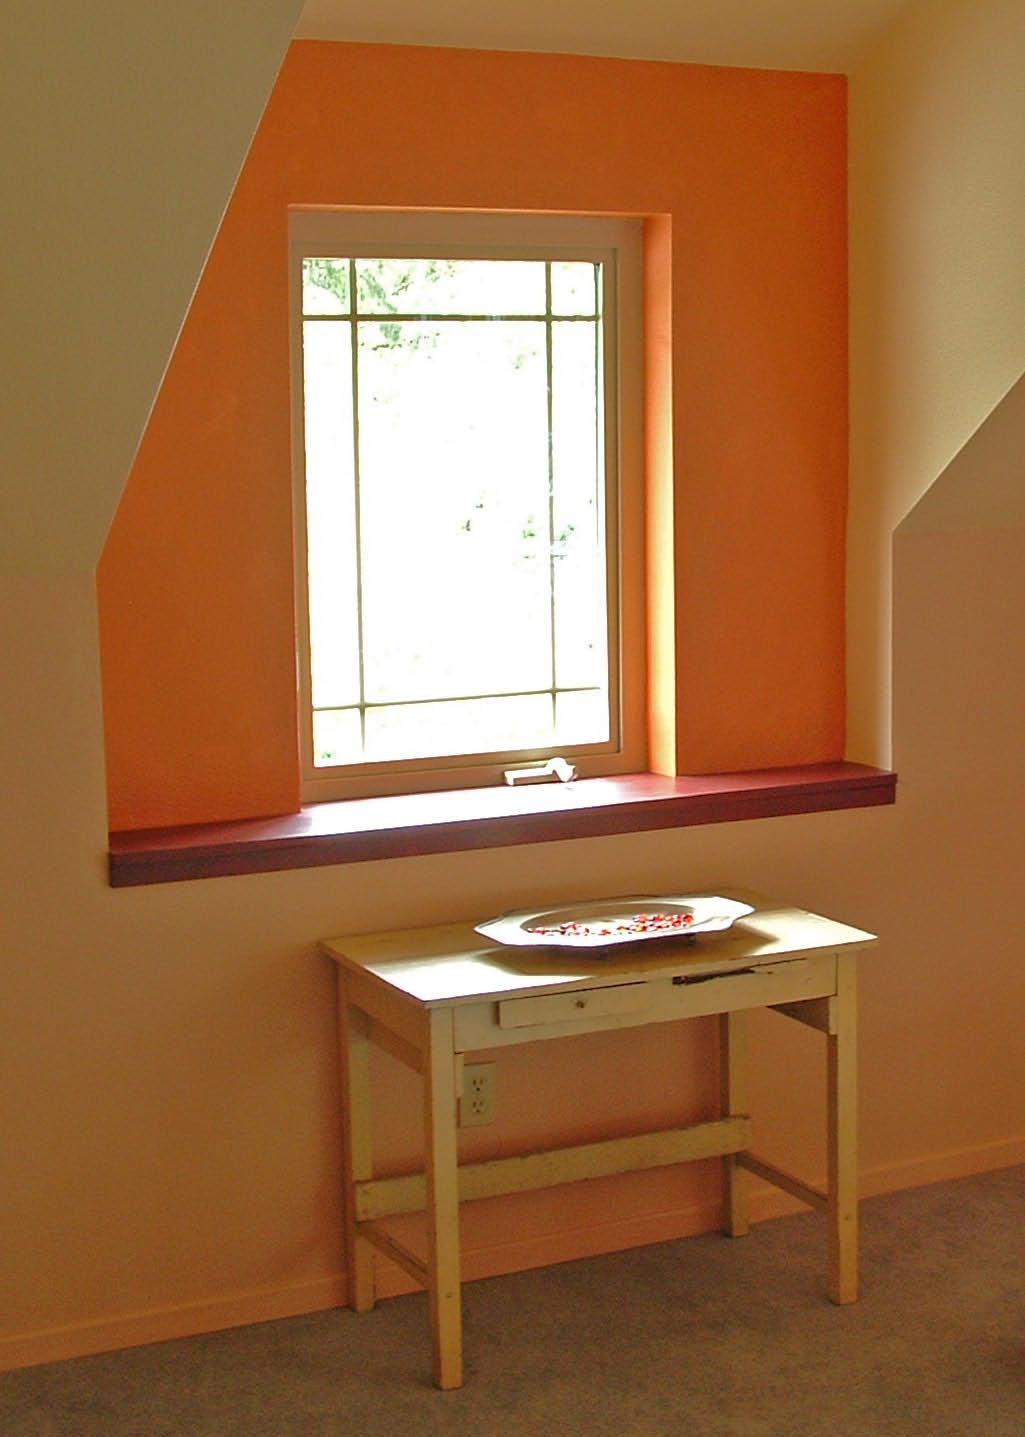 foundation dezin decor view of window. Black Bedroom Furniture Sets. Home Design Ideas